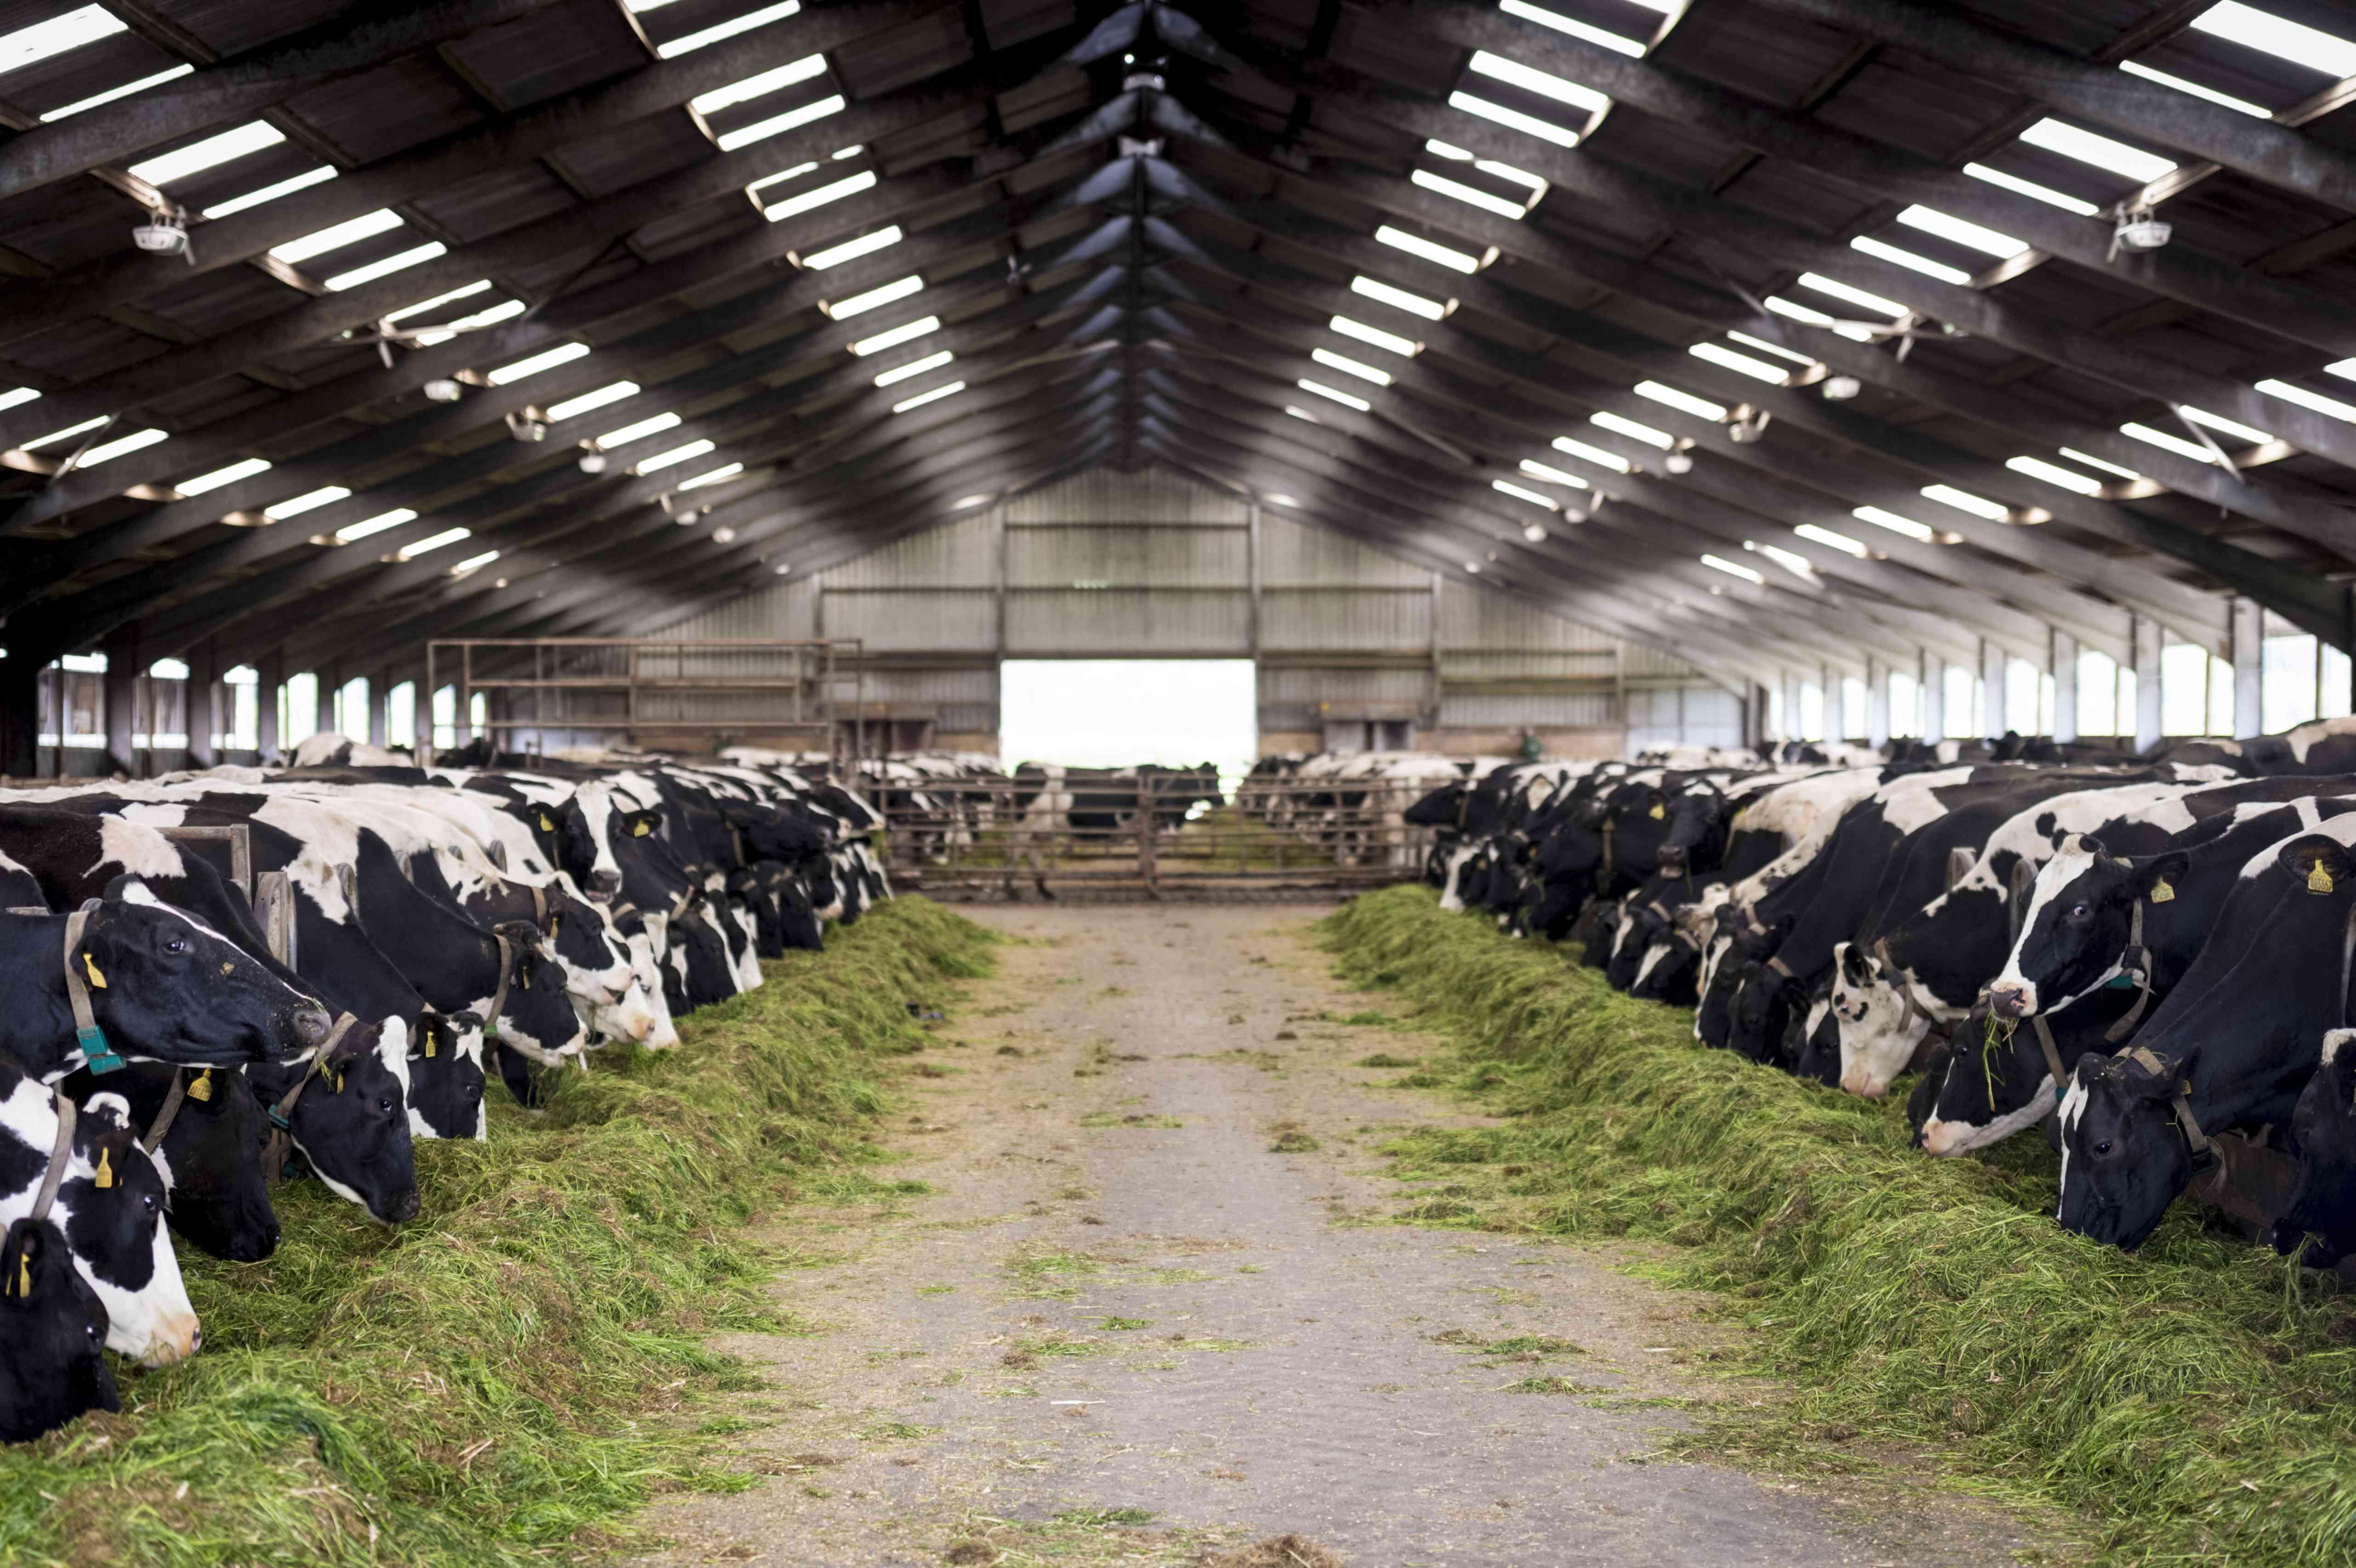 Dairy cows inside a barn